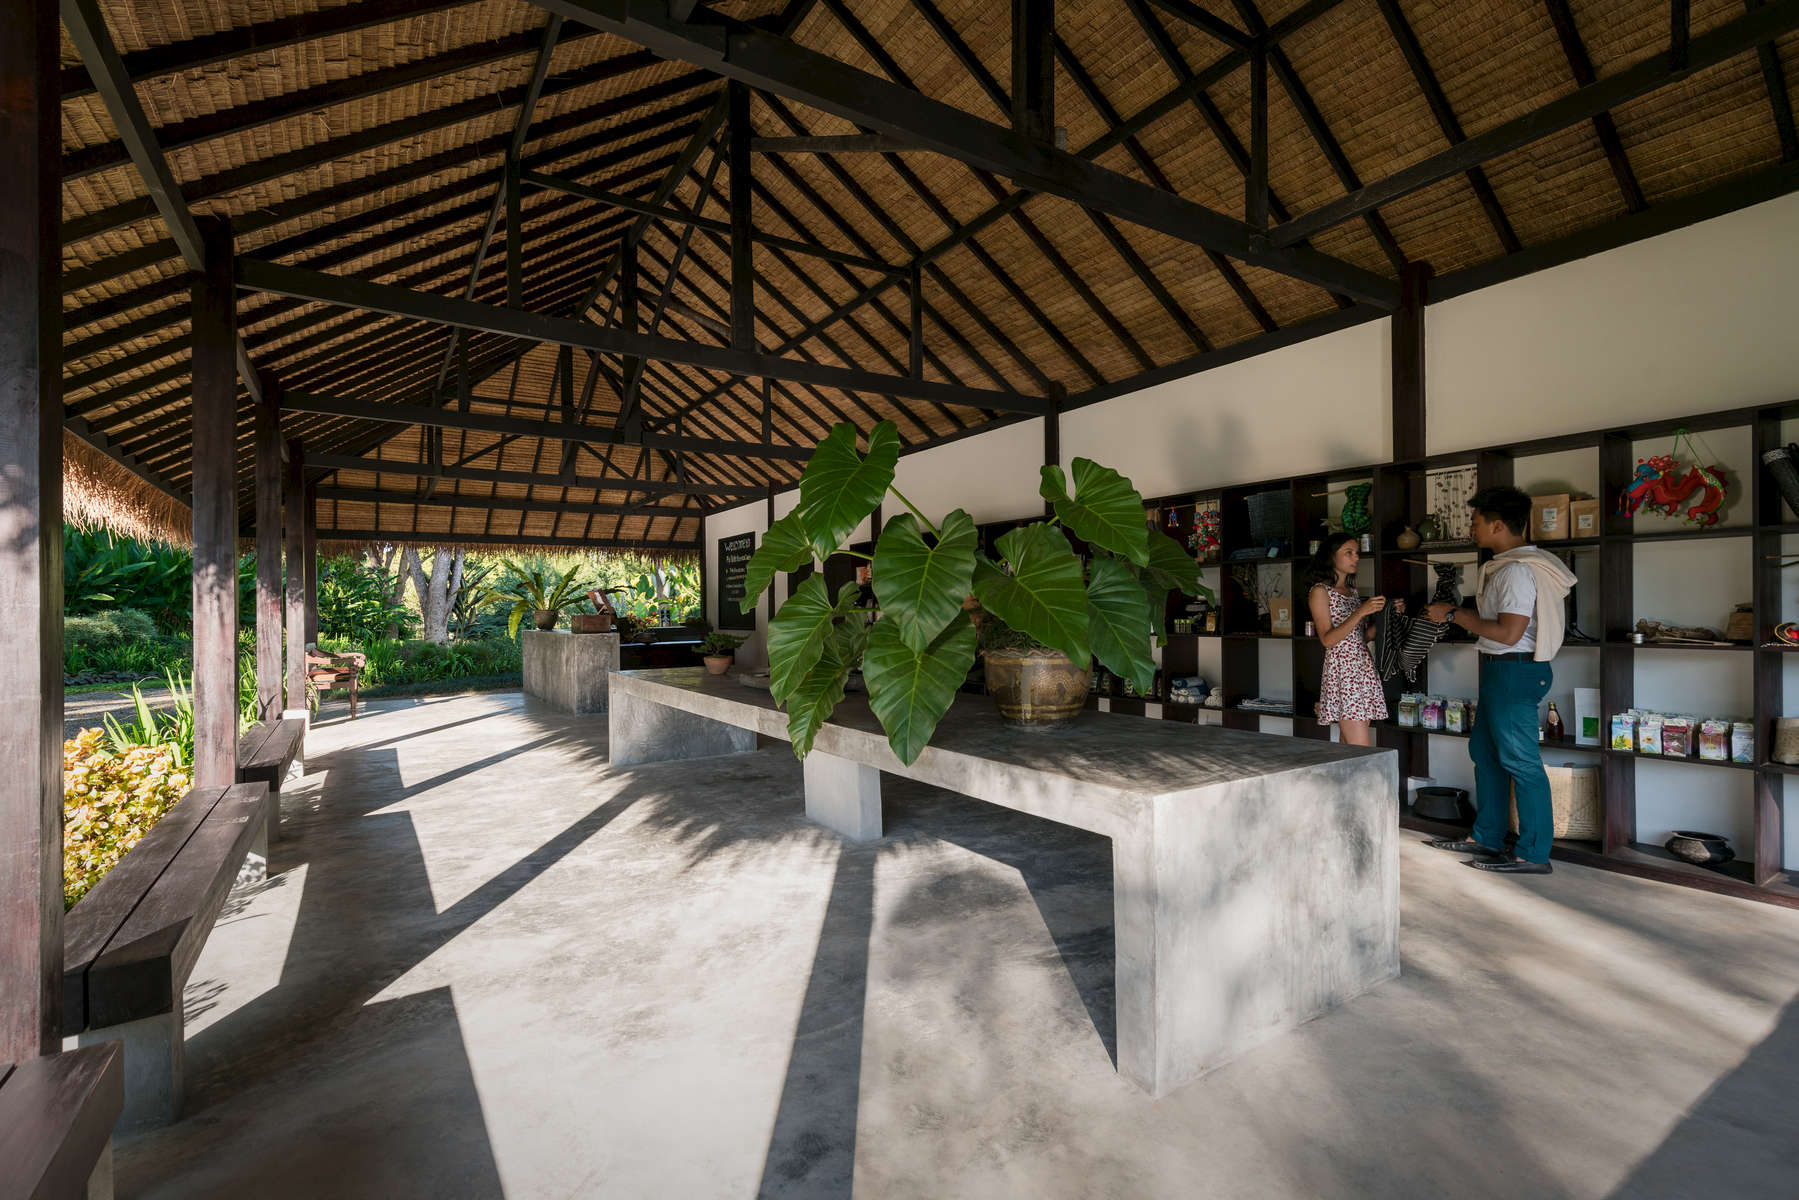 Laos-Luang-Prabang-Pha-Tad-Khe-Botanical-Garden-Photo-by-Cyril-Eberle-DSC04669-vignette-1.jpg